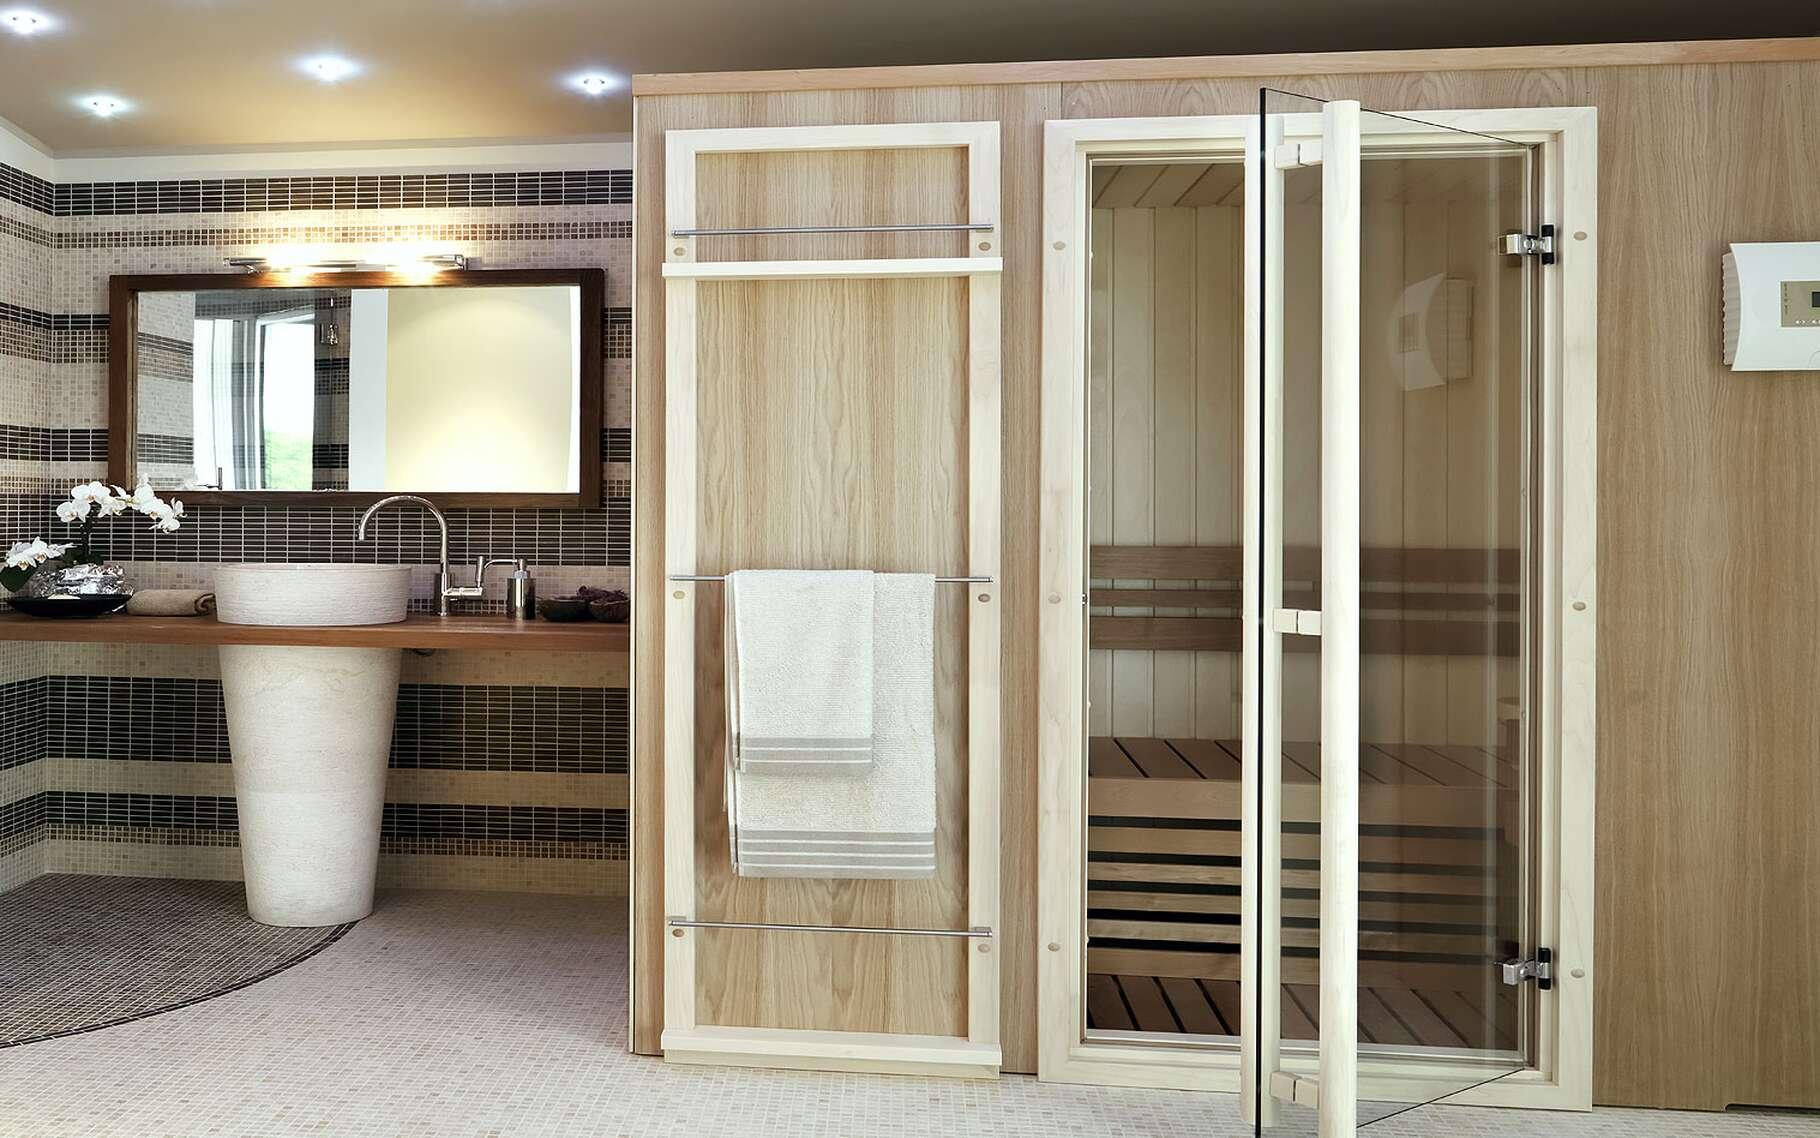 Cabine De Sauna Prix les cabines sauna | dossier